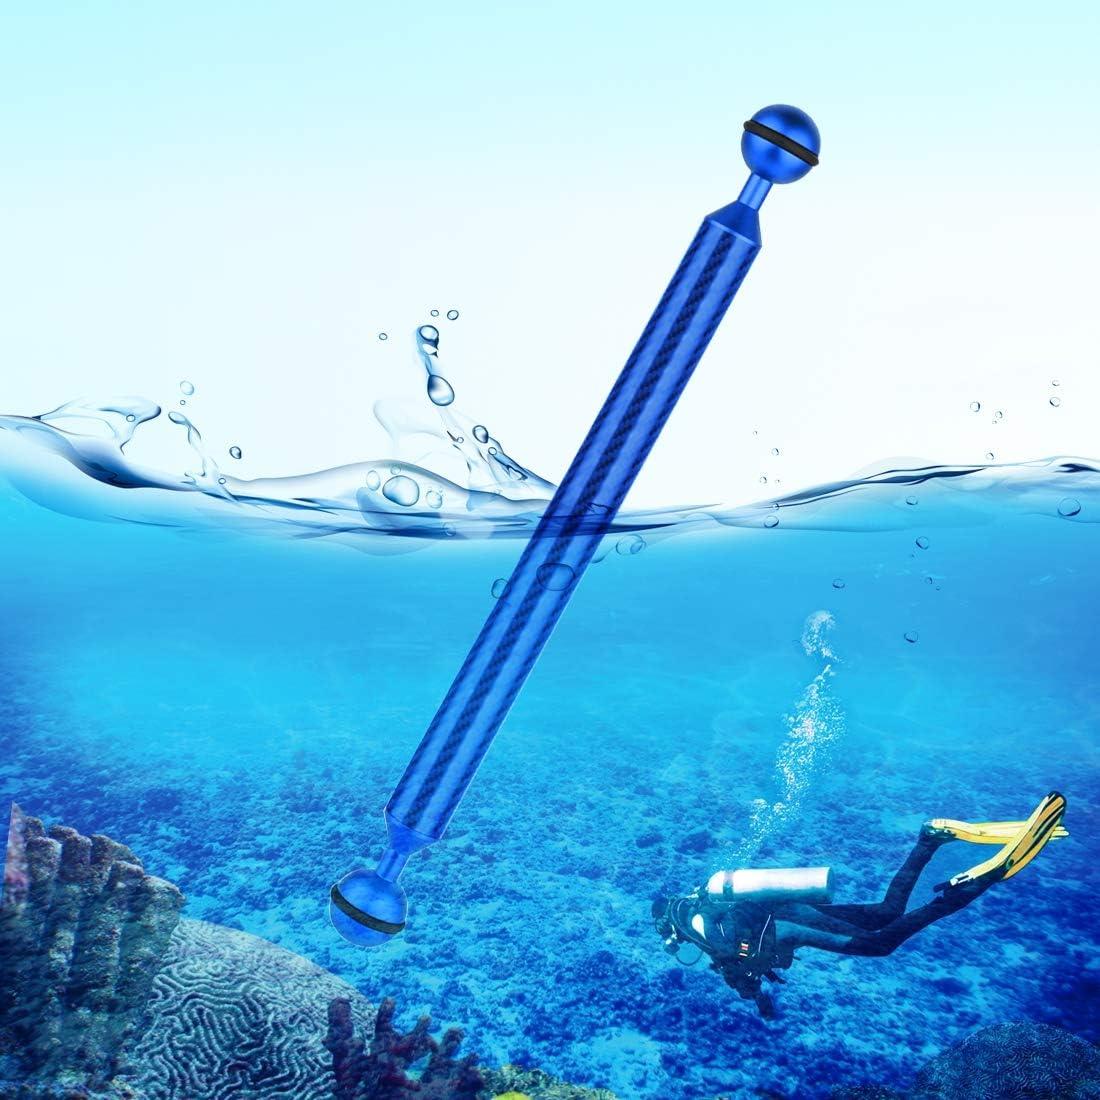 GuiPing 11 inch 27.9cm Length 20.8mm Diameter Dual Balls Carbon Fiber Floating Arm Ball Diameter 25mm Durable Color : Black